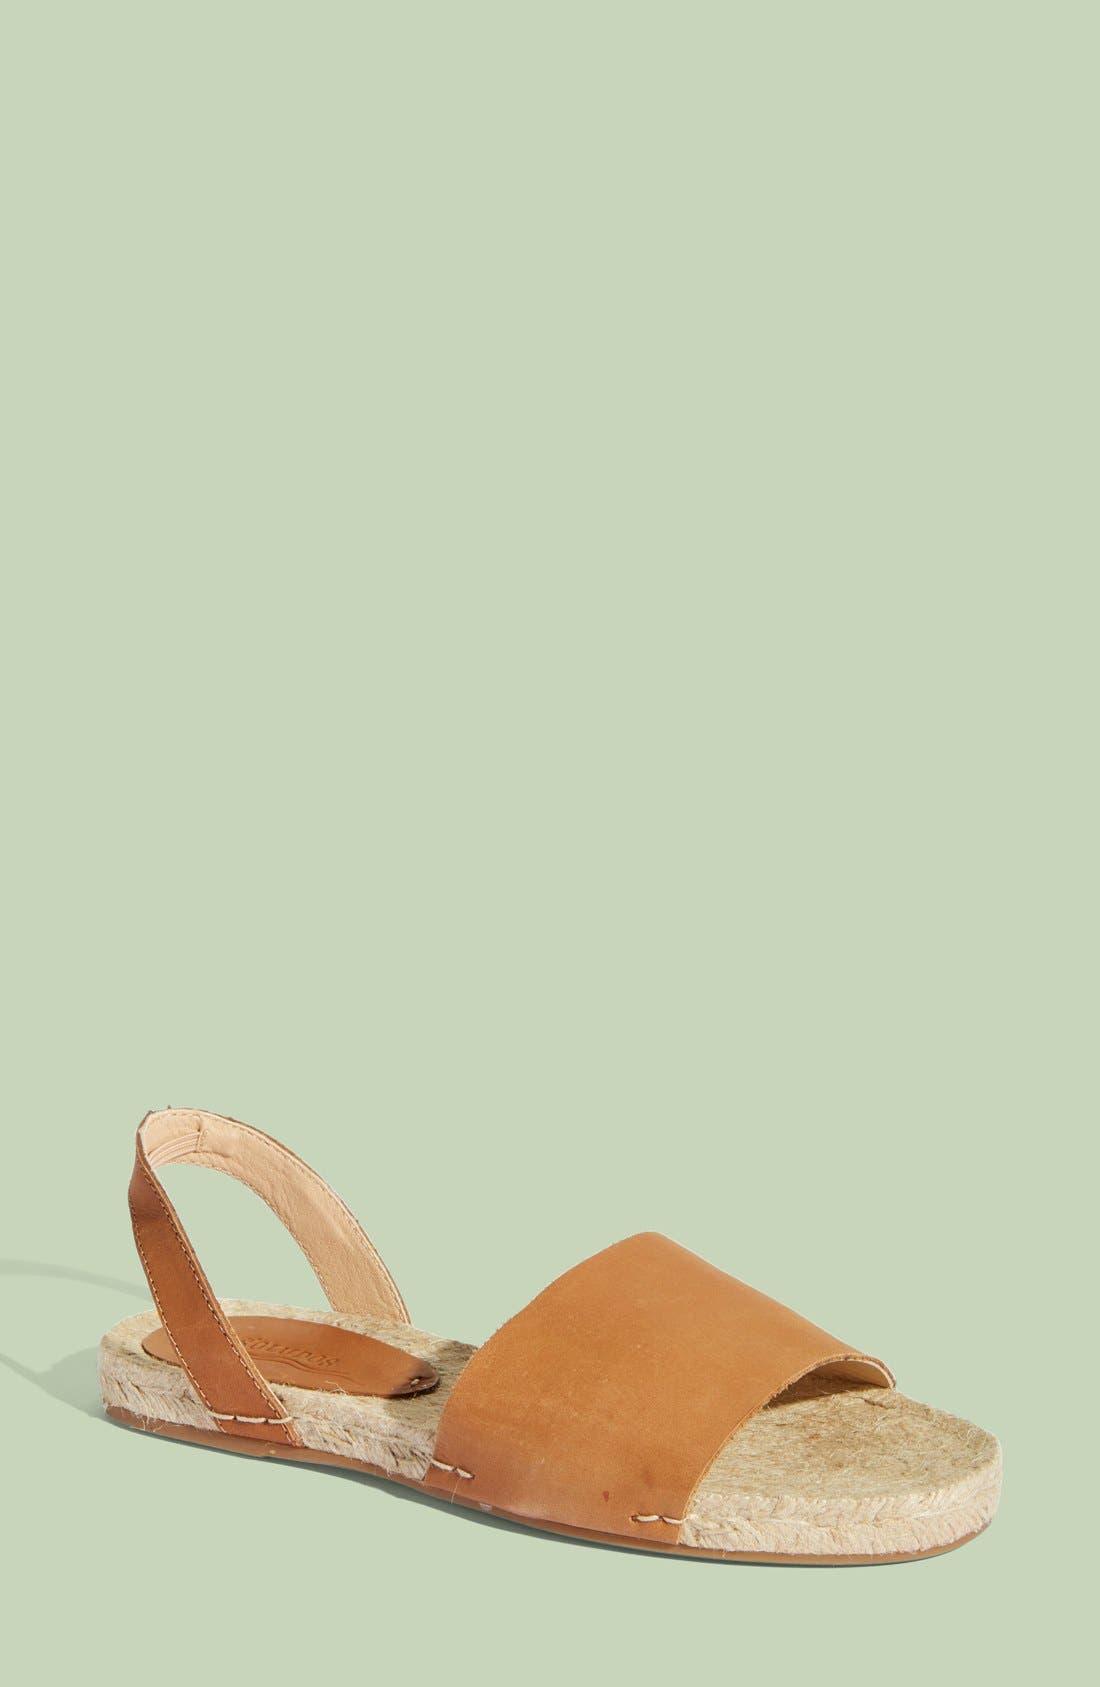 SOLUDOS Slingback Sandal, Main, color, 211